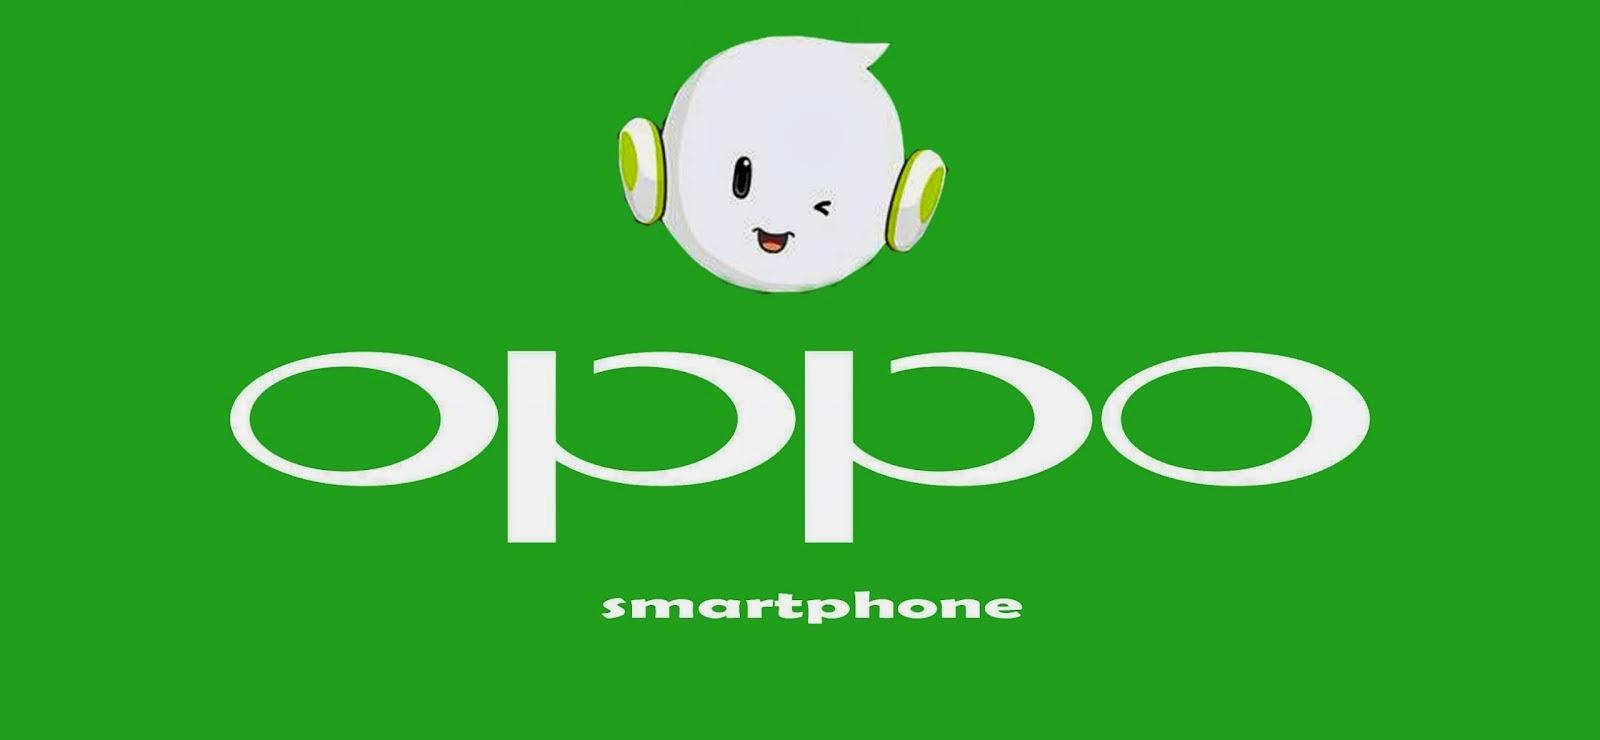 KinjengNet Image Harga Hp Oppo Smartphone Terbaru 2014